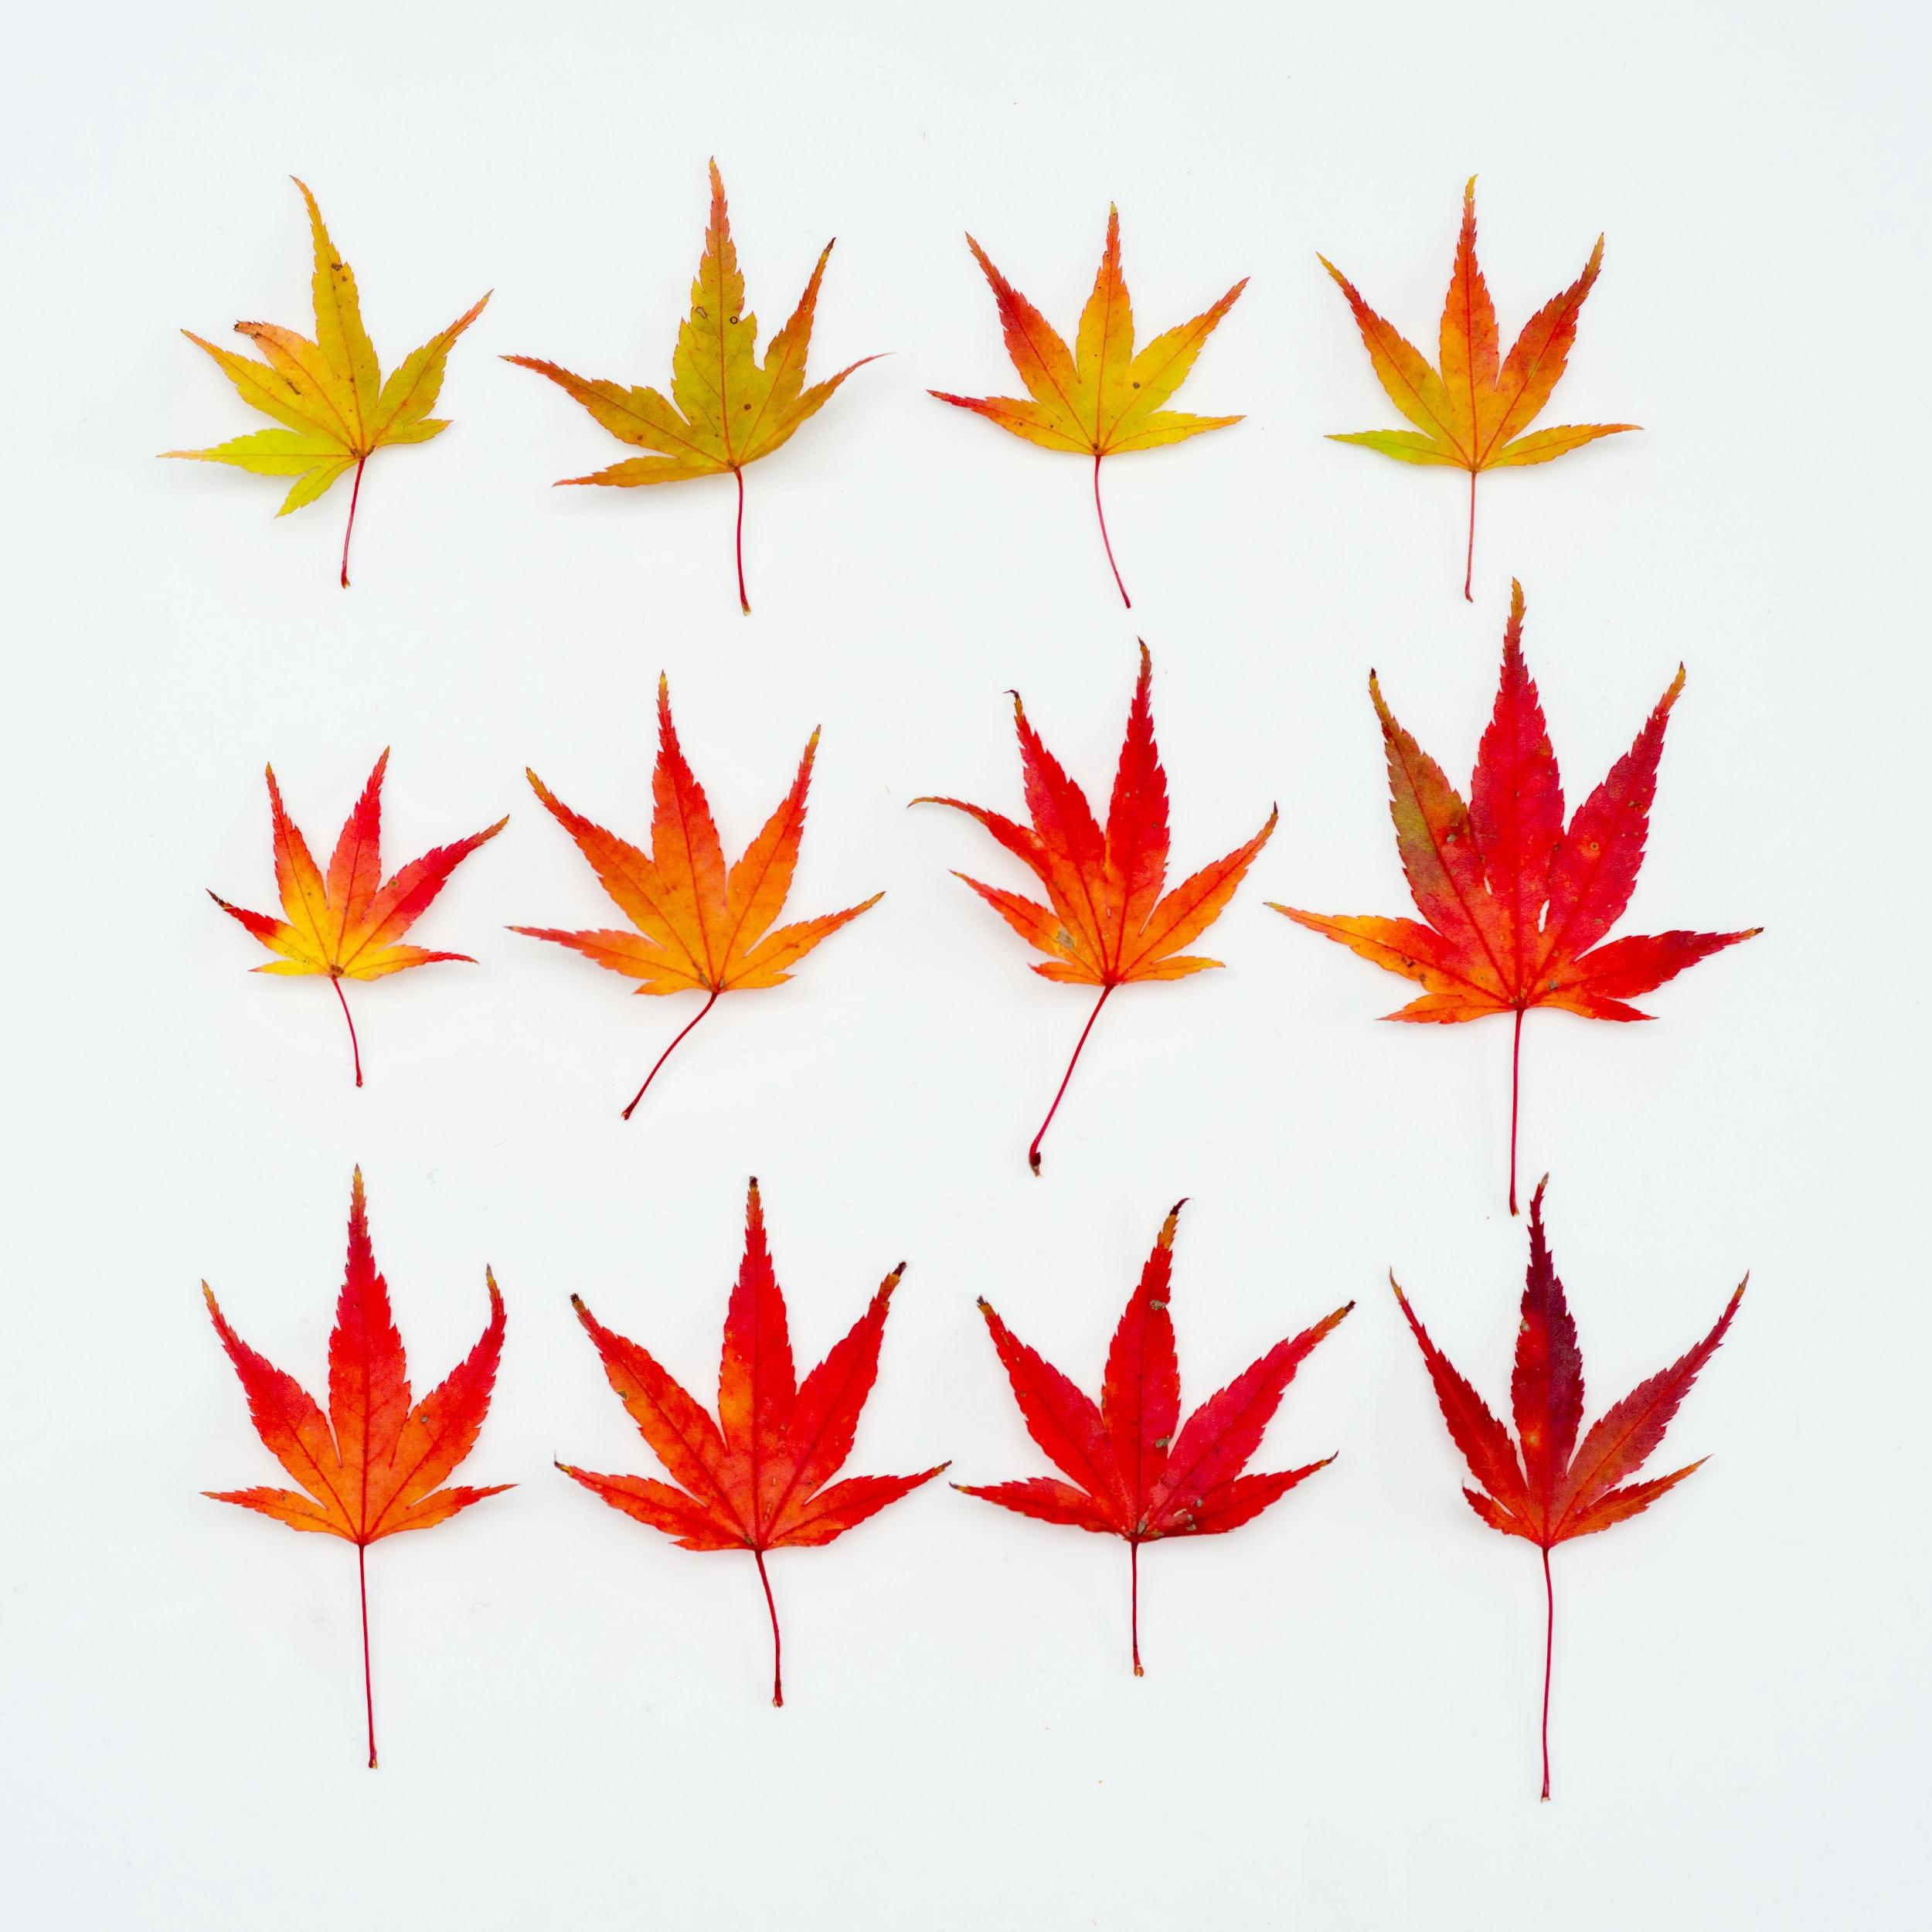 www.iaincrockart.com_flora-2673.jpg